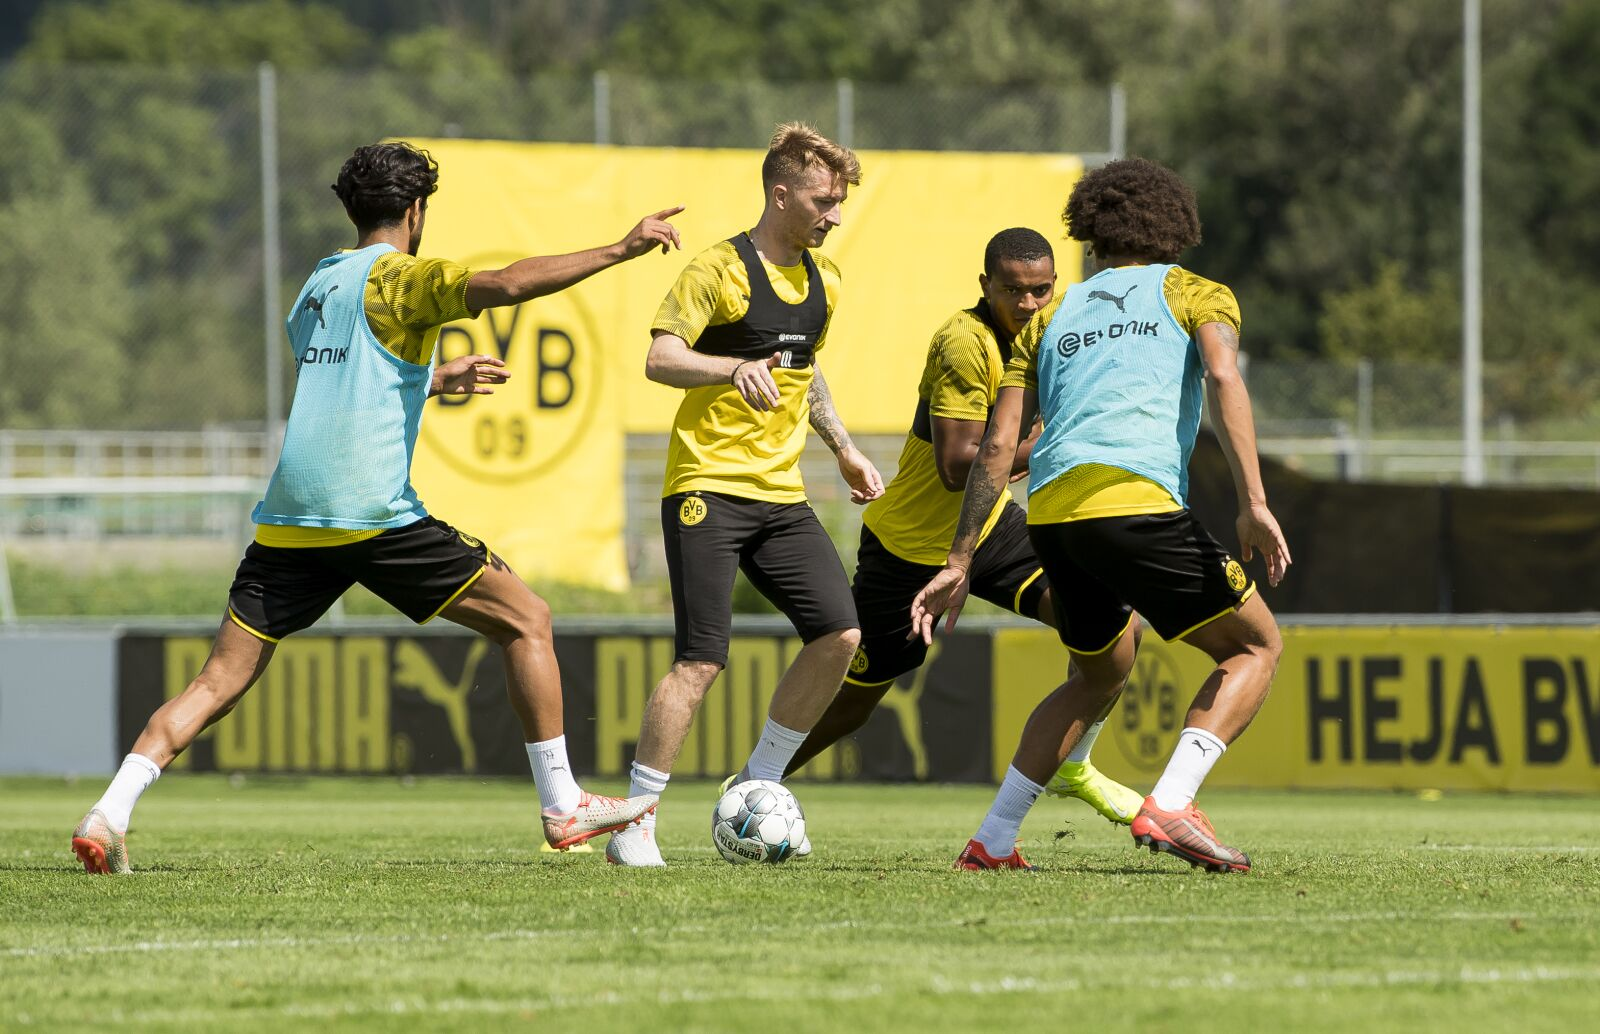 DFL Supercup Preview: Borussia Dortmund vs Bayern Munich